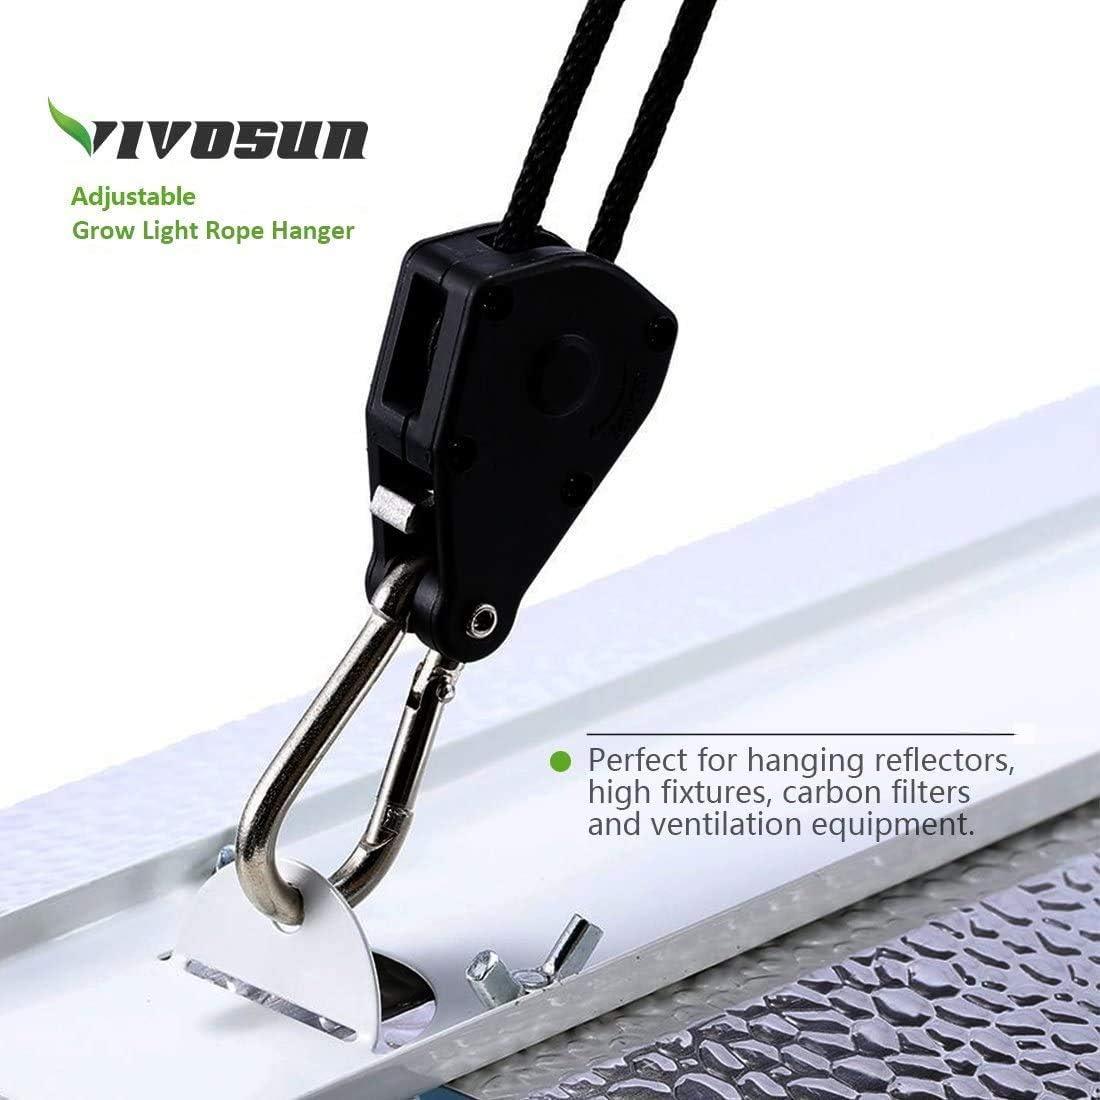 VIVOSUN 1//8 Adjustable Grow Light Reflector Clip Rope Hanger 6 Pair